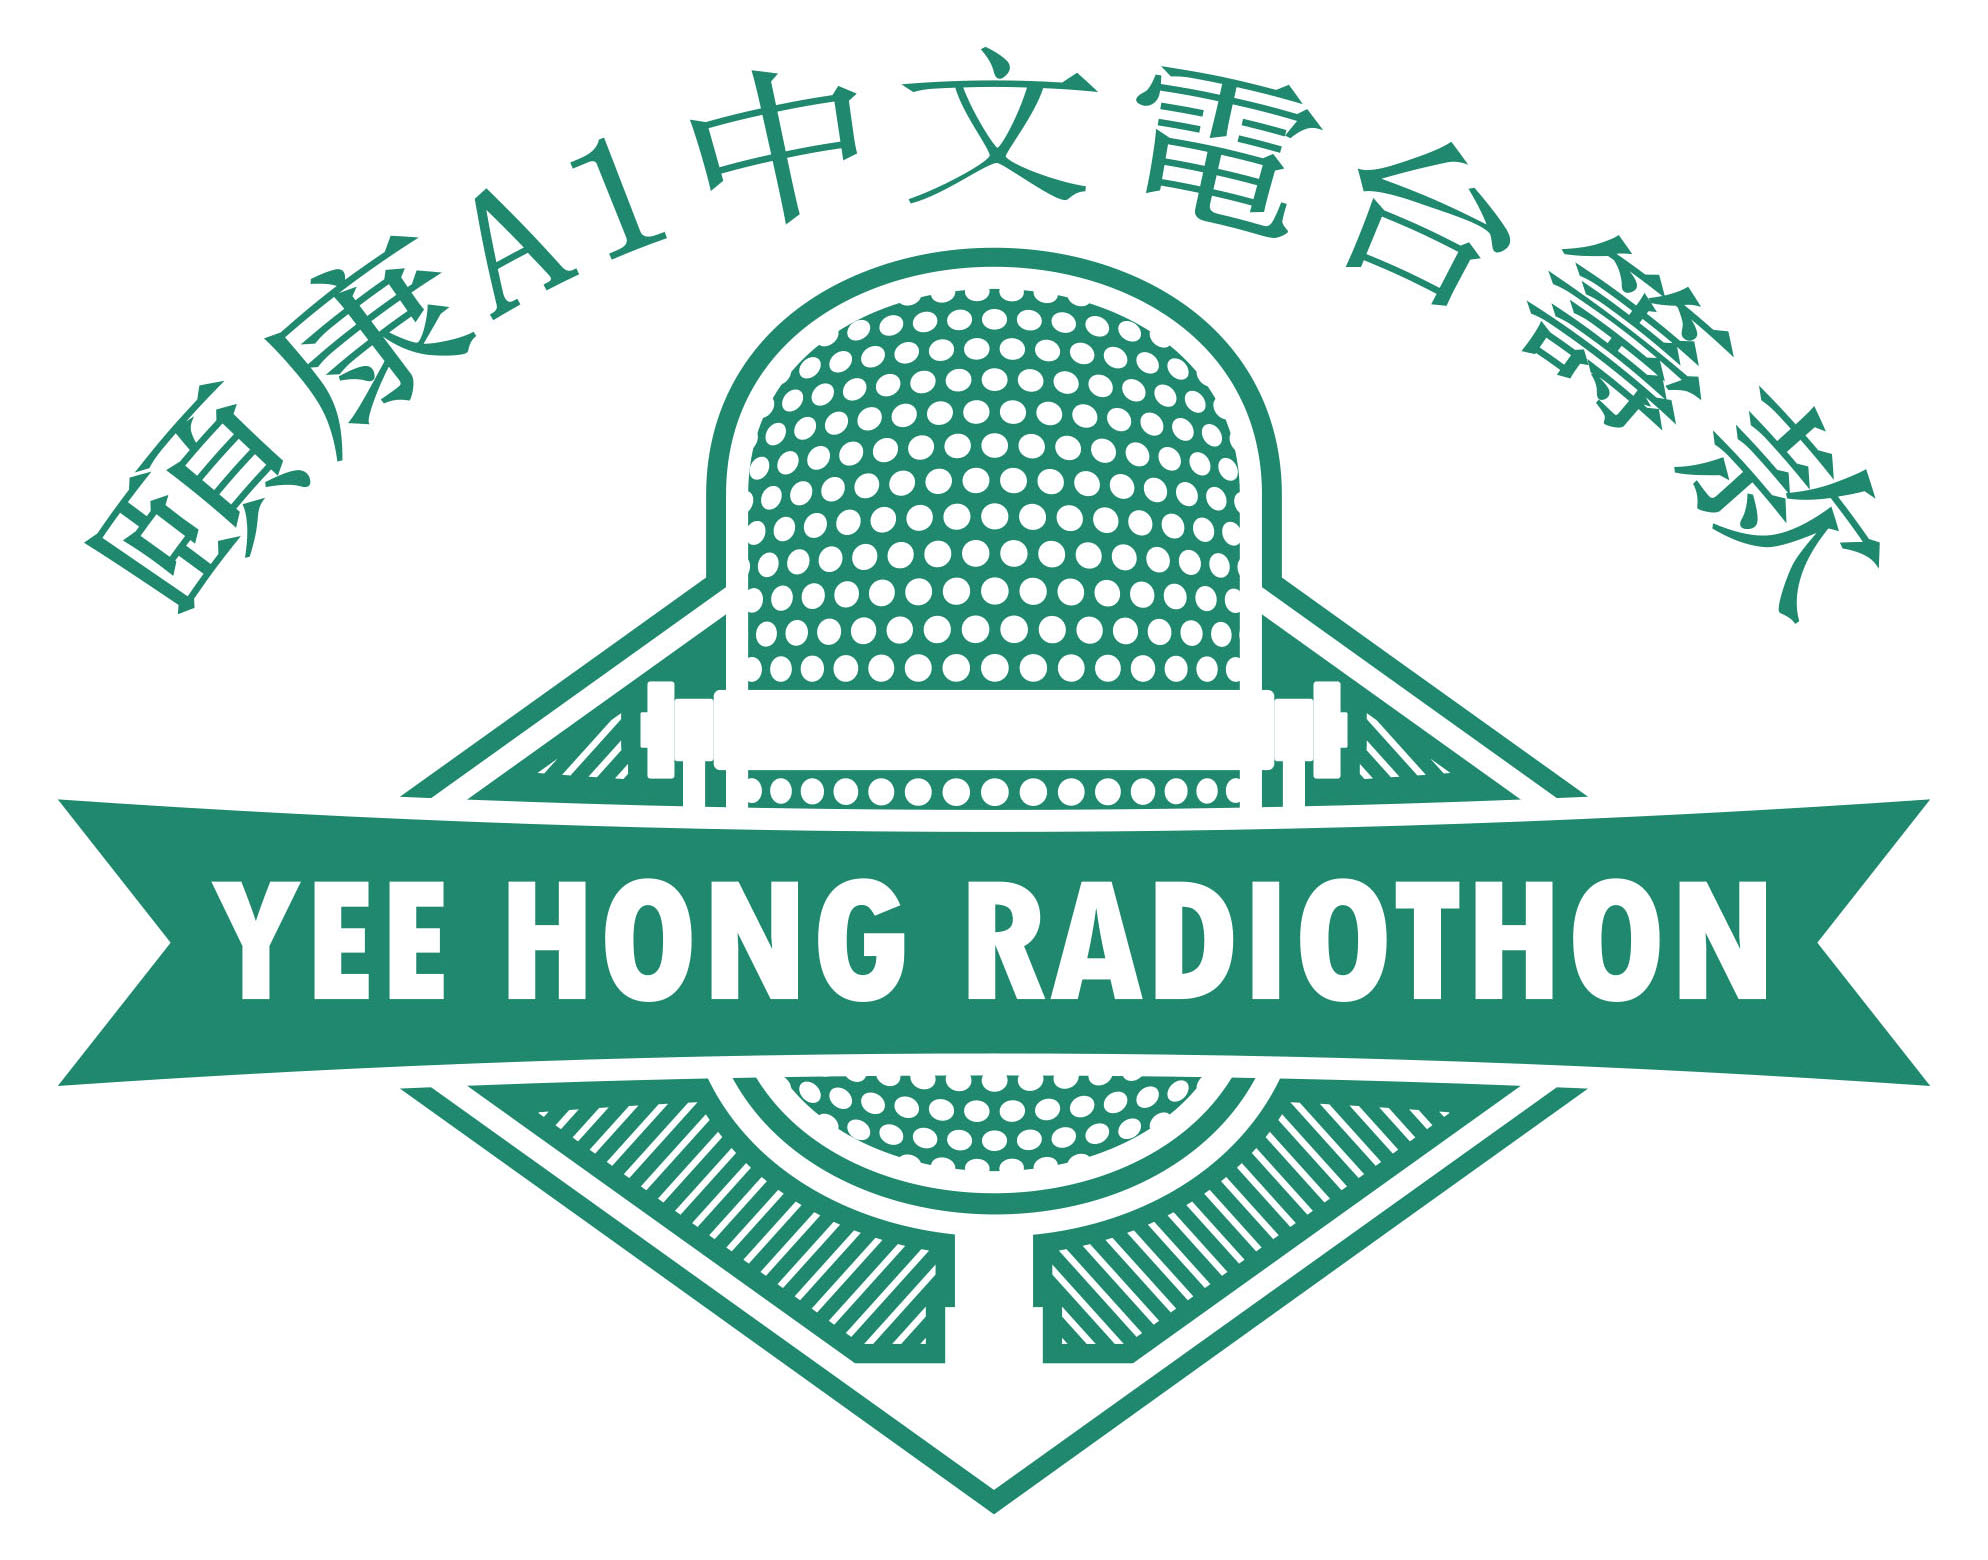 A1 Radiothon logo